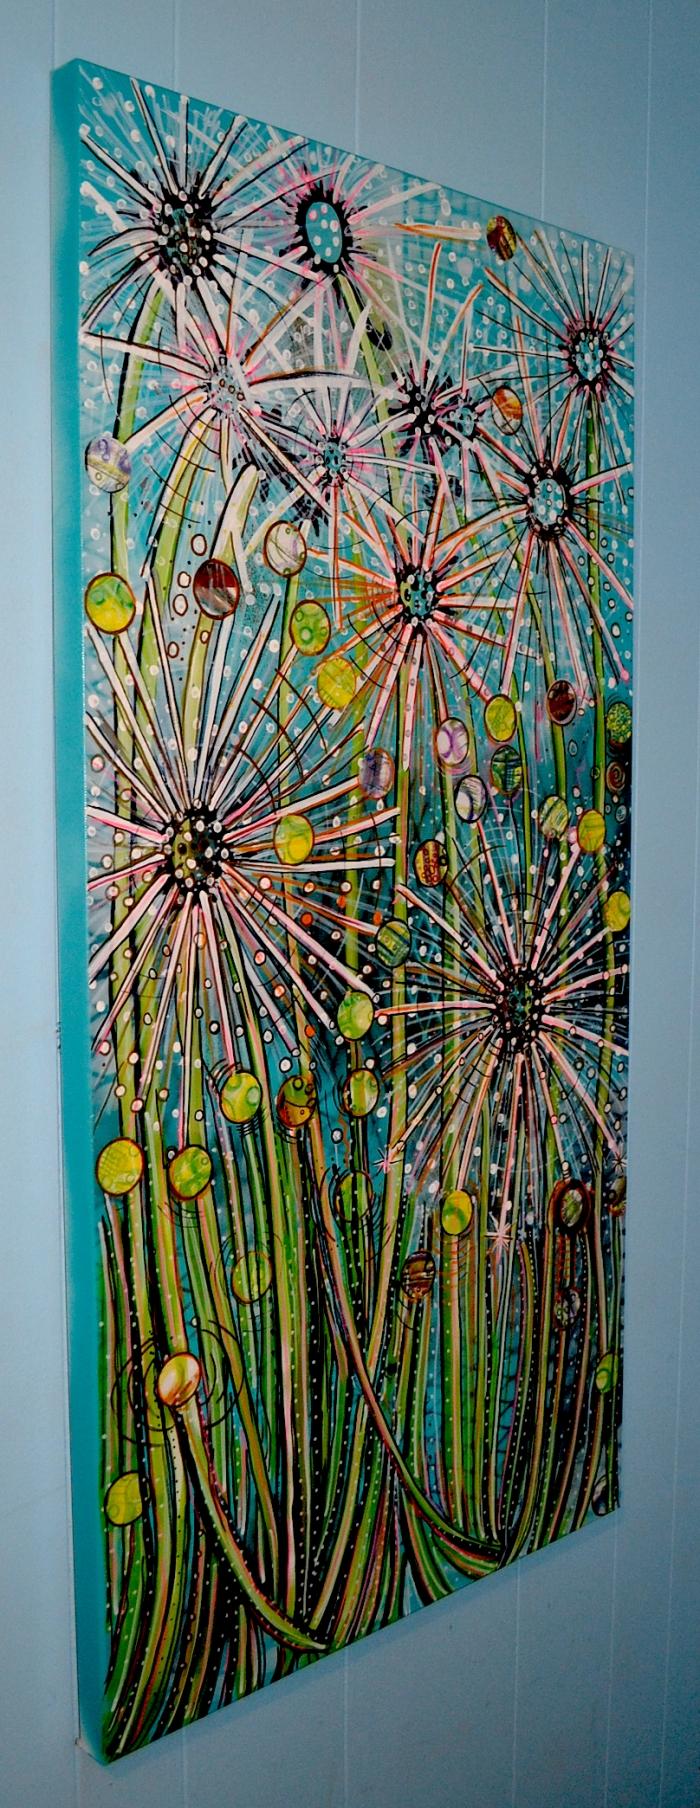 Fireworks & Dandilions